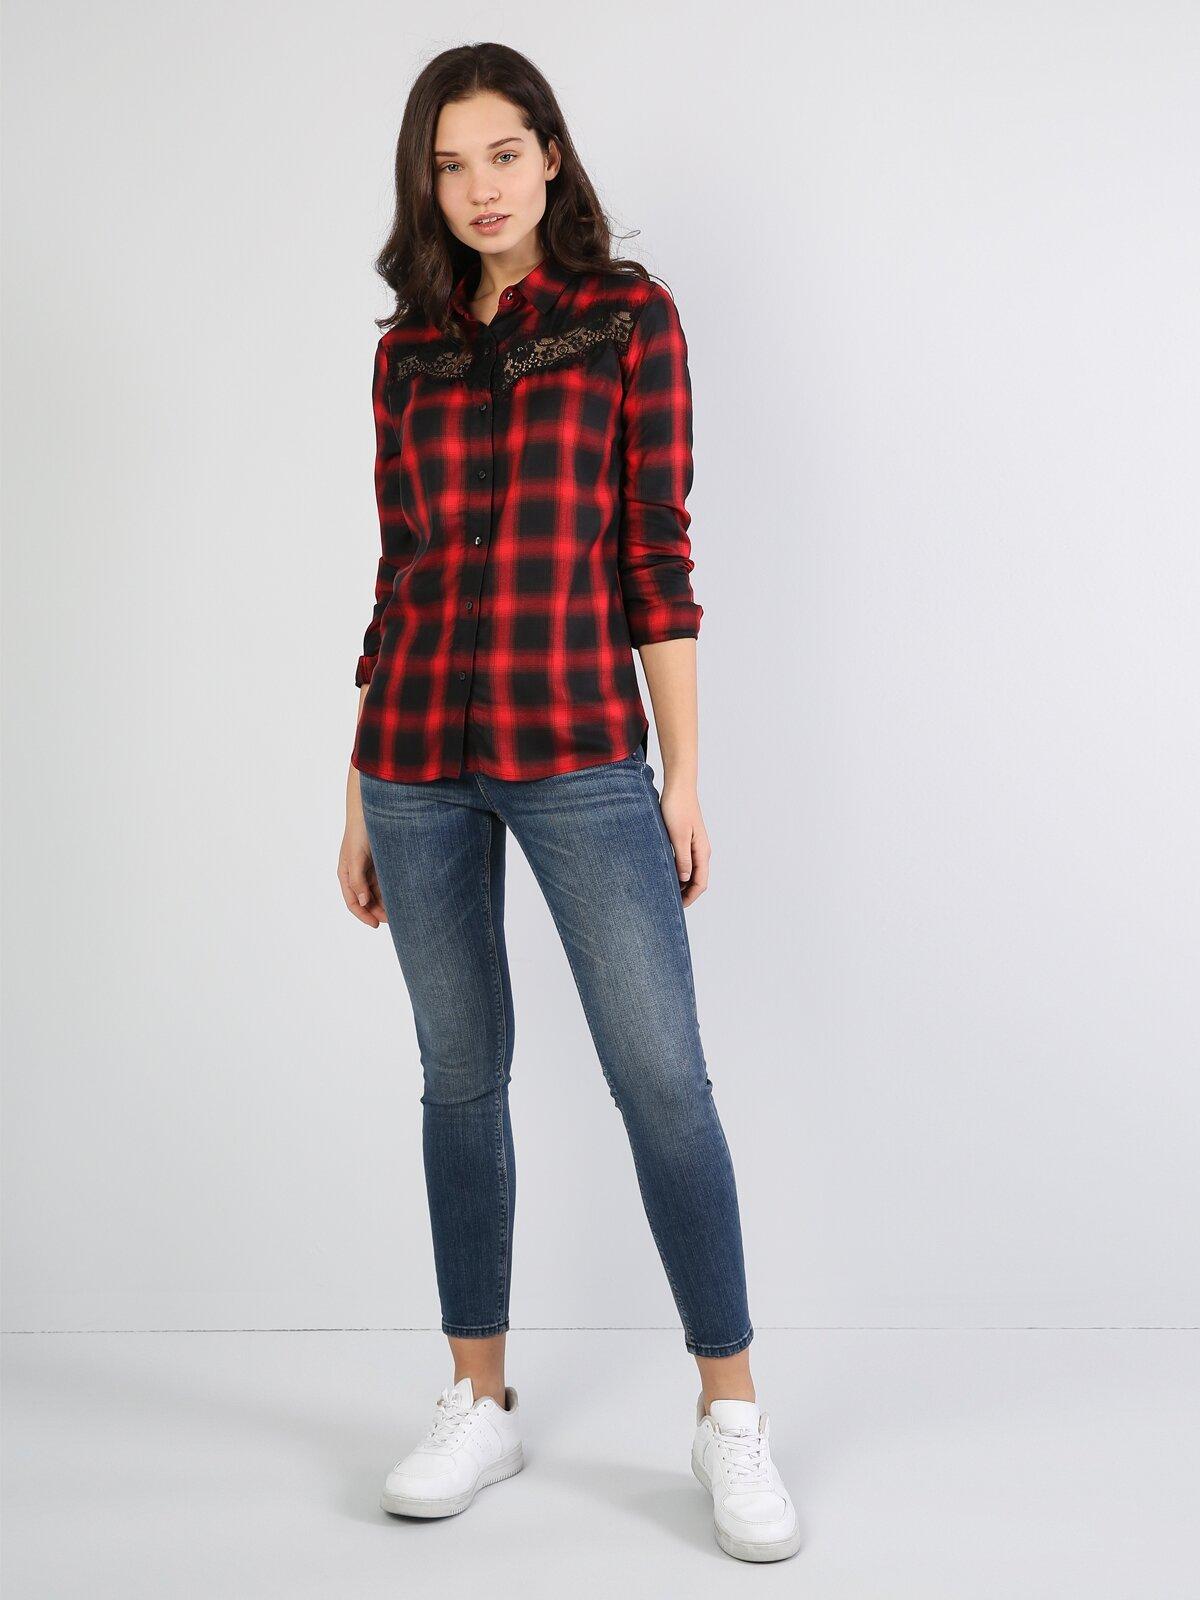 Süper Slim Fit Shirt Neck Kadın Siyah Uzun Kol Gömlek